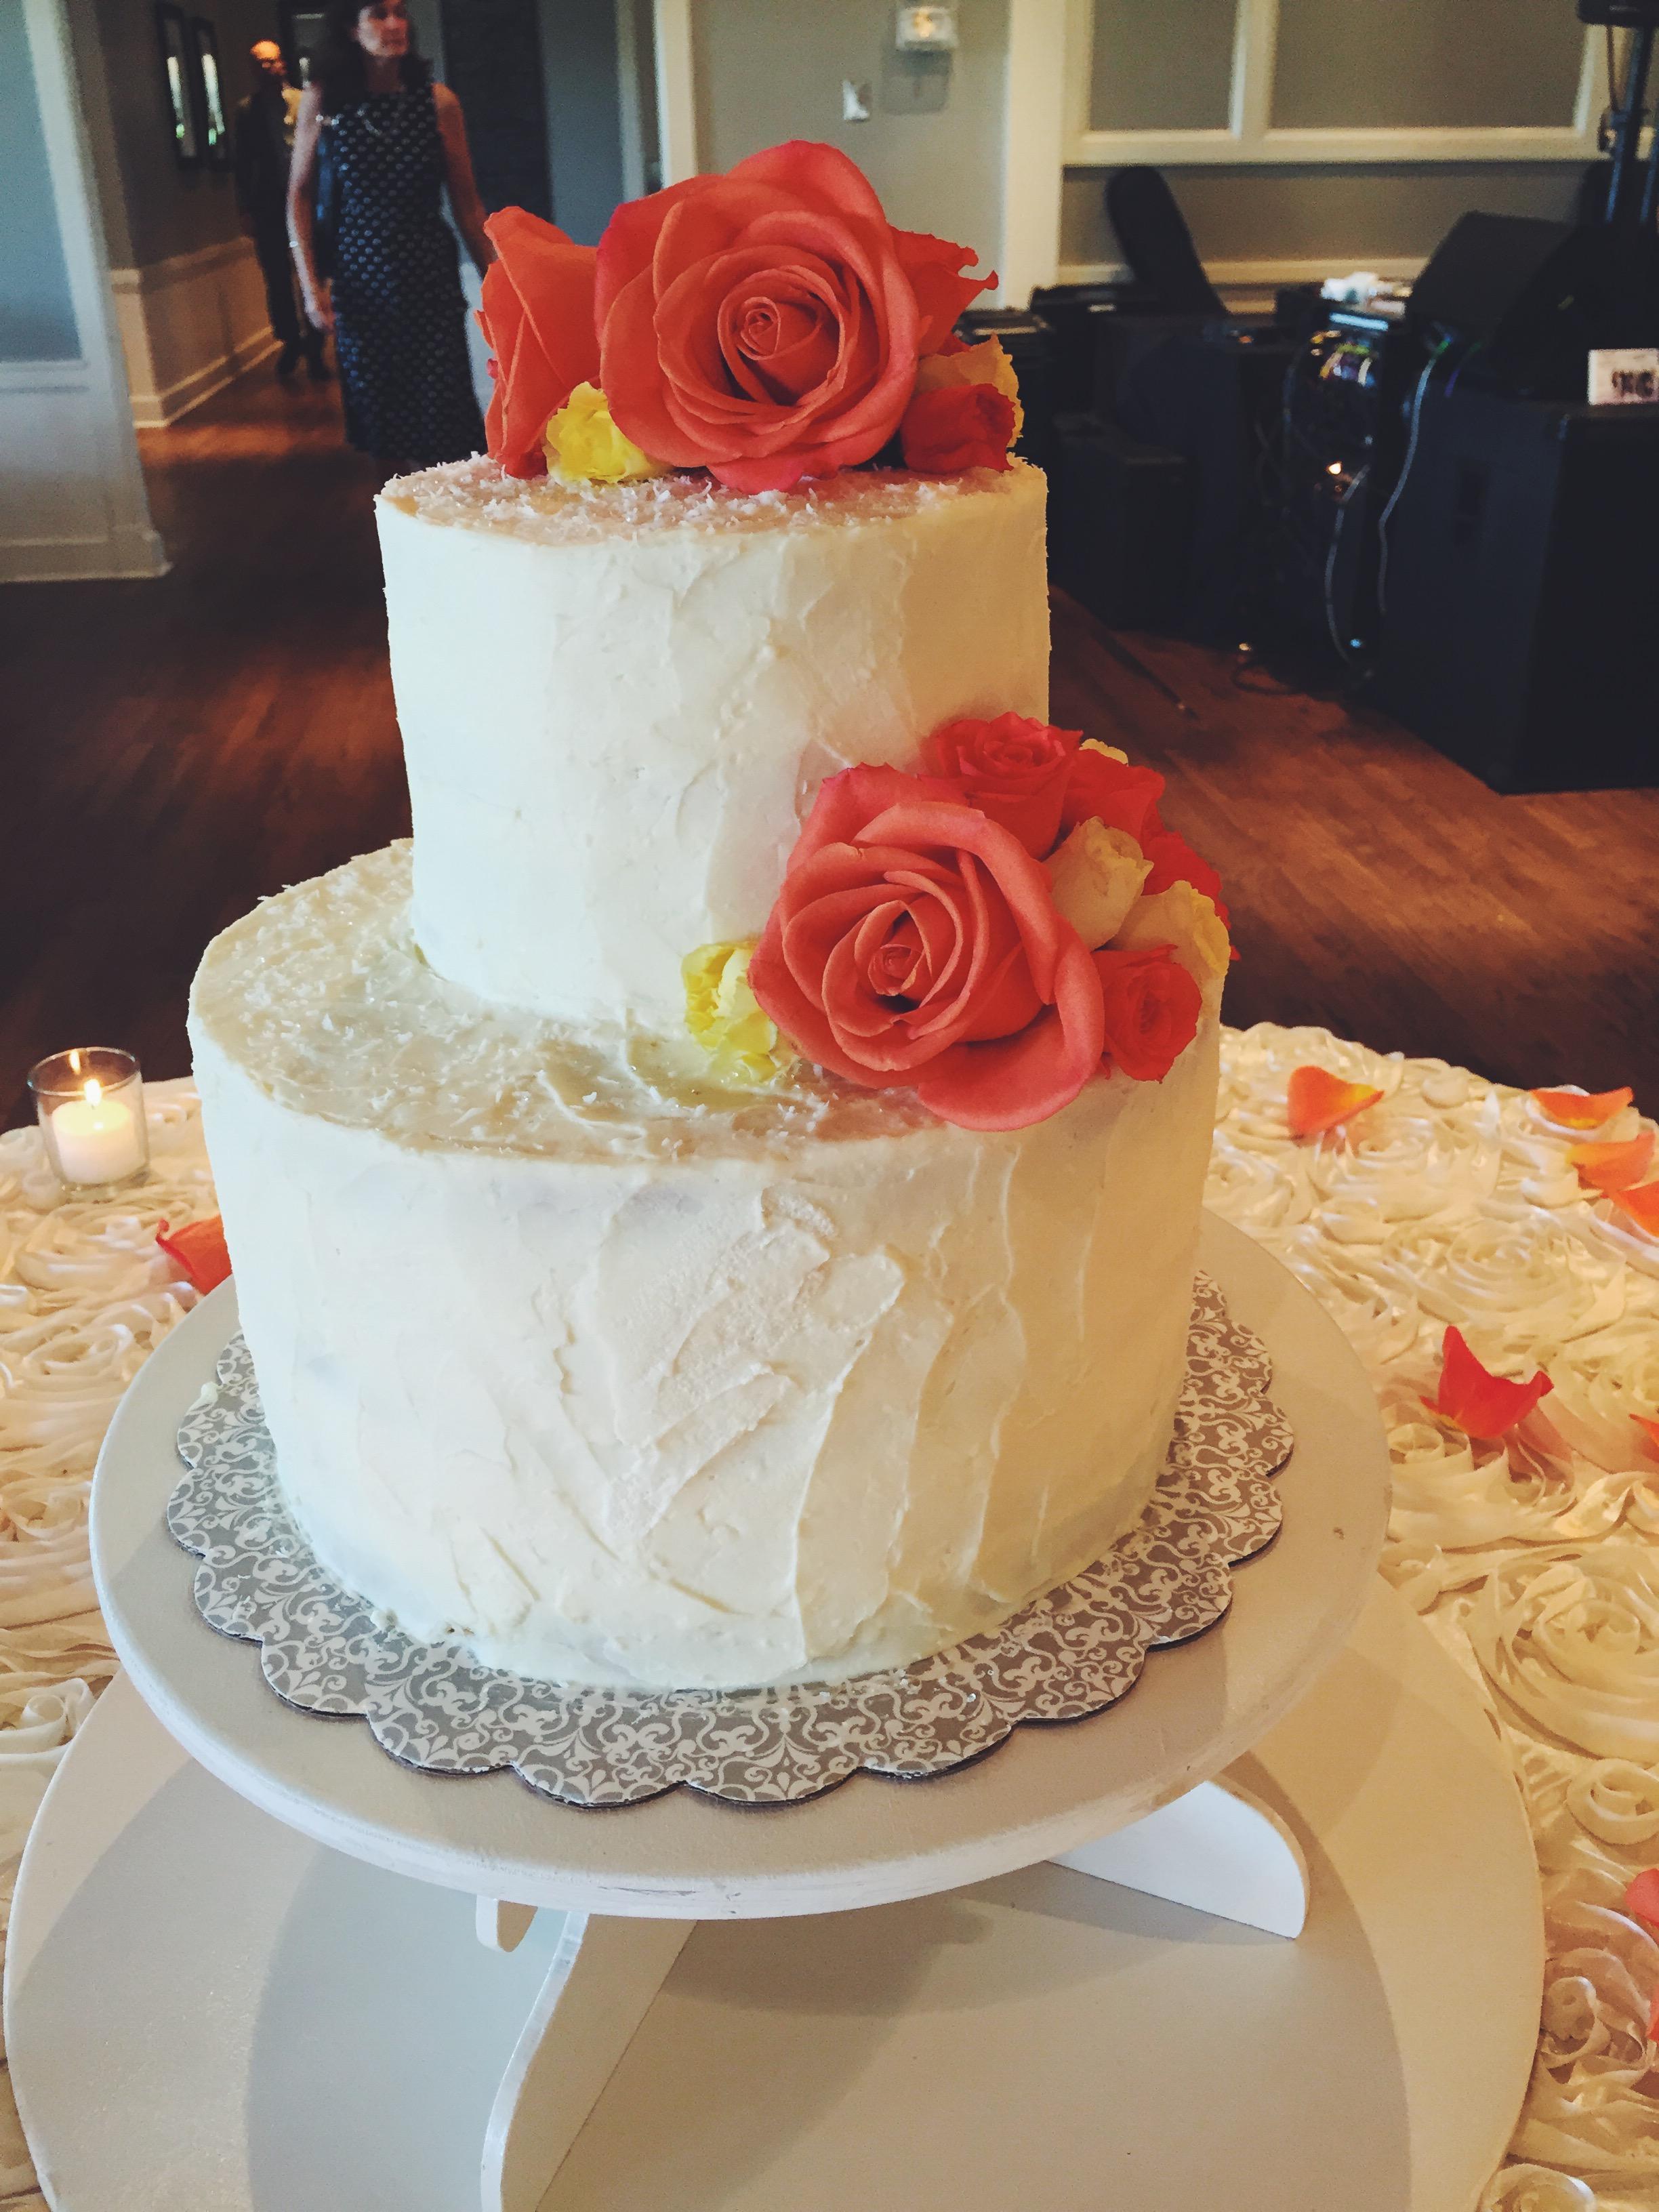 coconut wedding cake with chocolate ganache and coconut